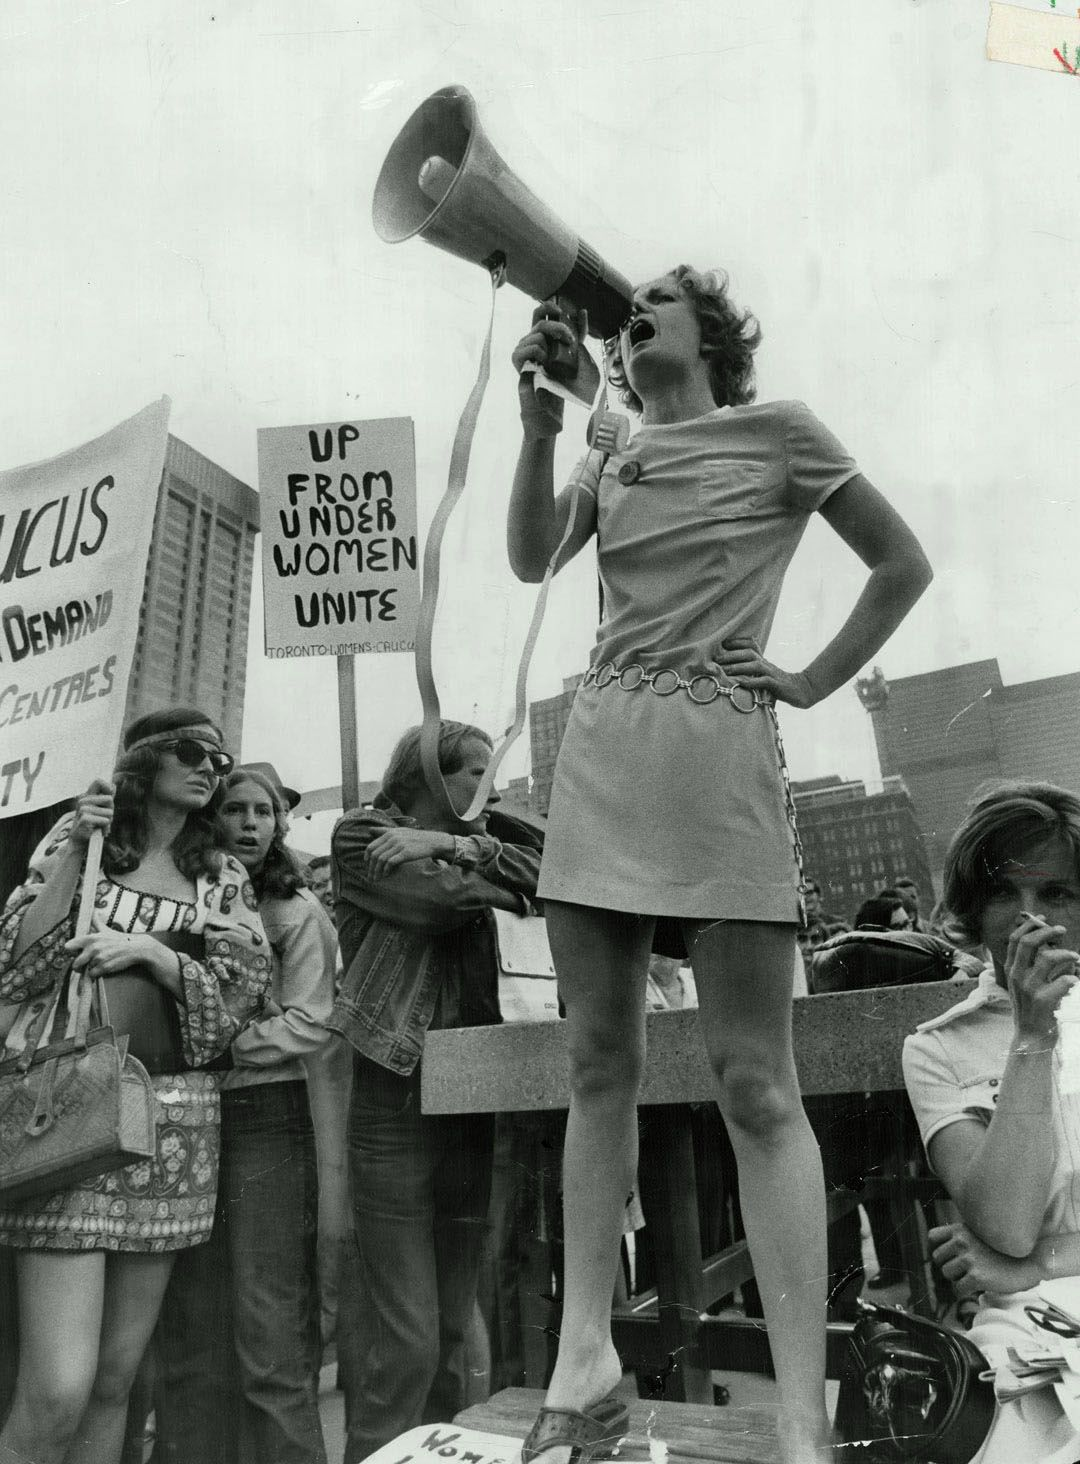 Права женщин картинка